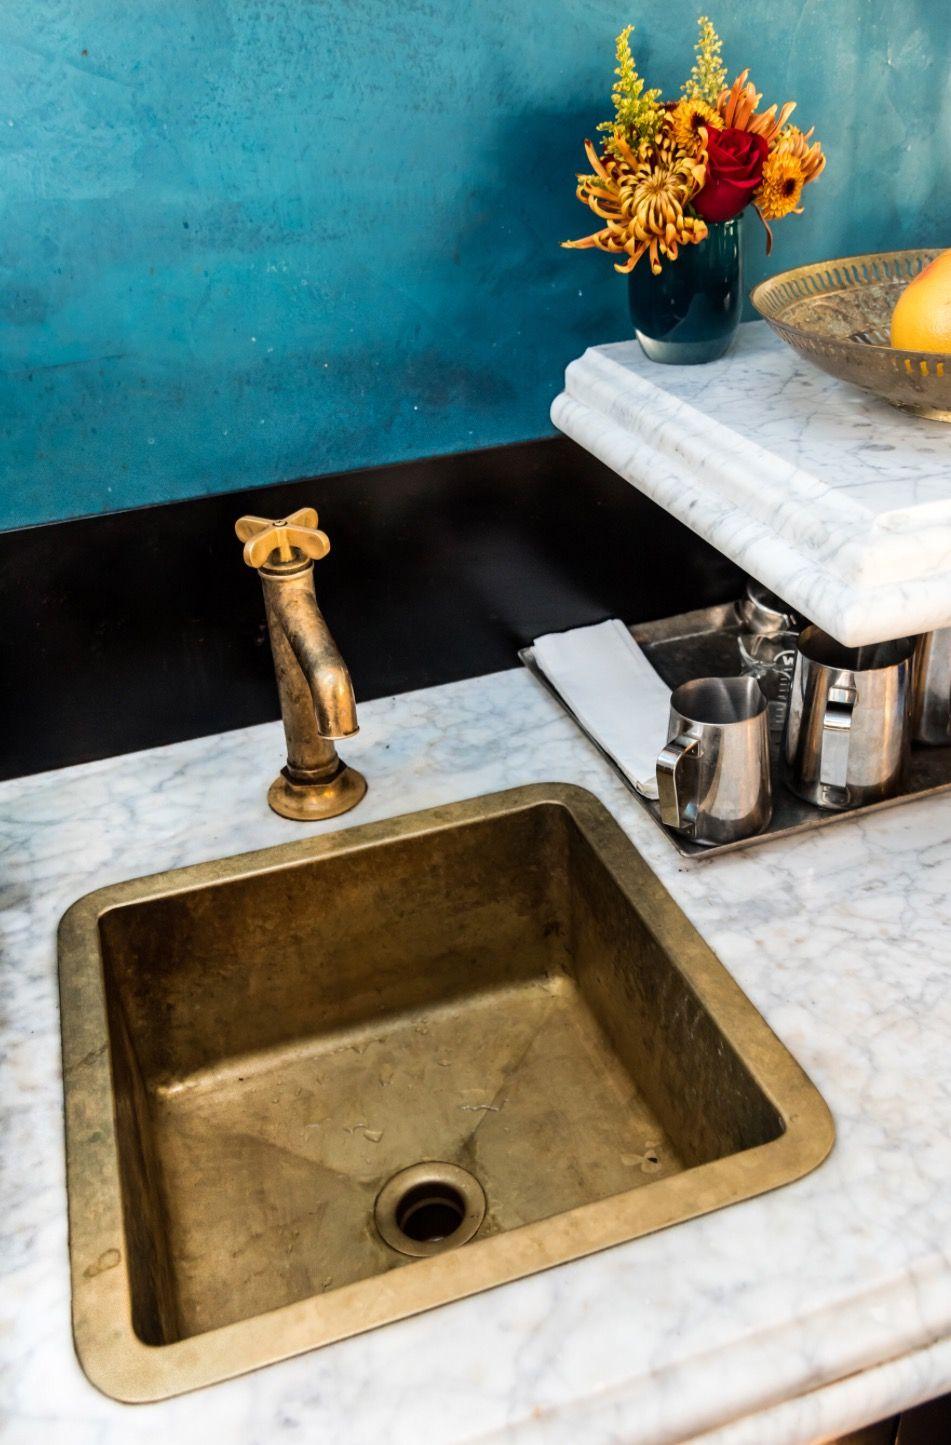 The Alexander Marchant Handmade Waterloo Bar Sink In Unlacquered